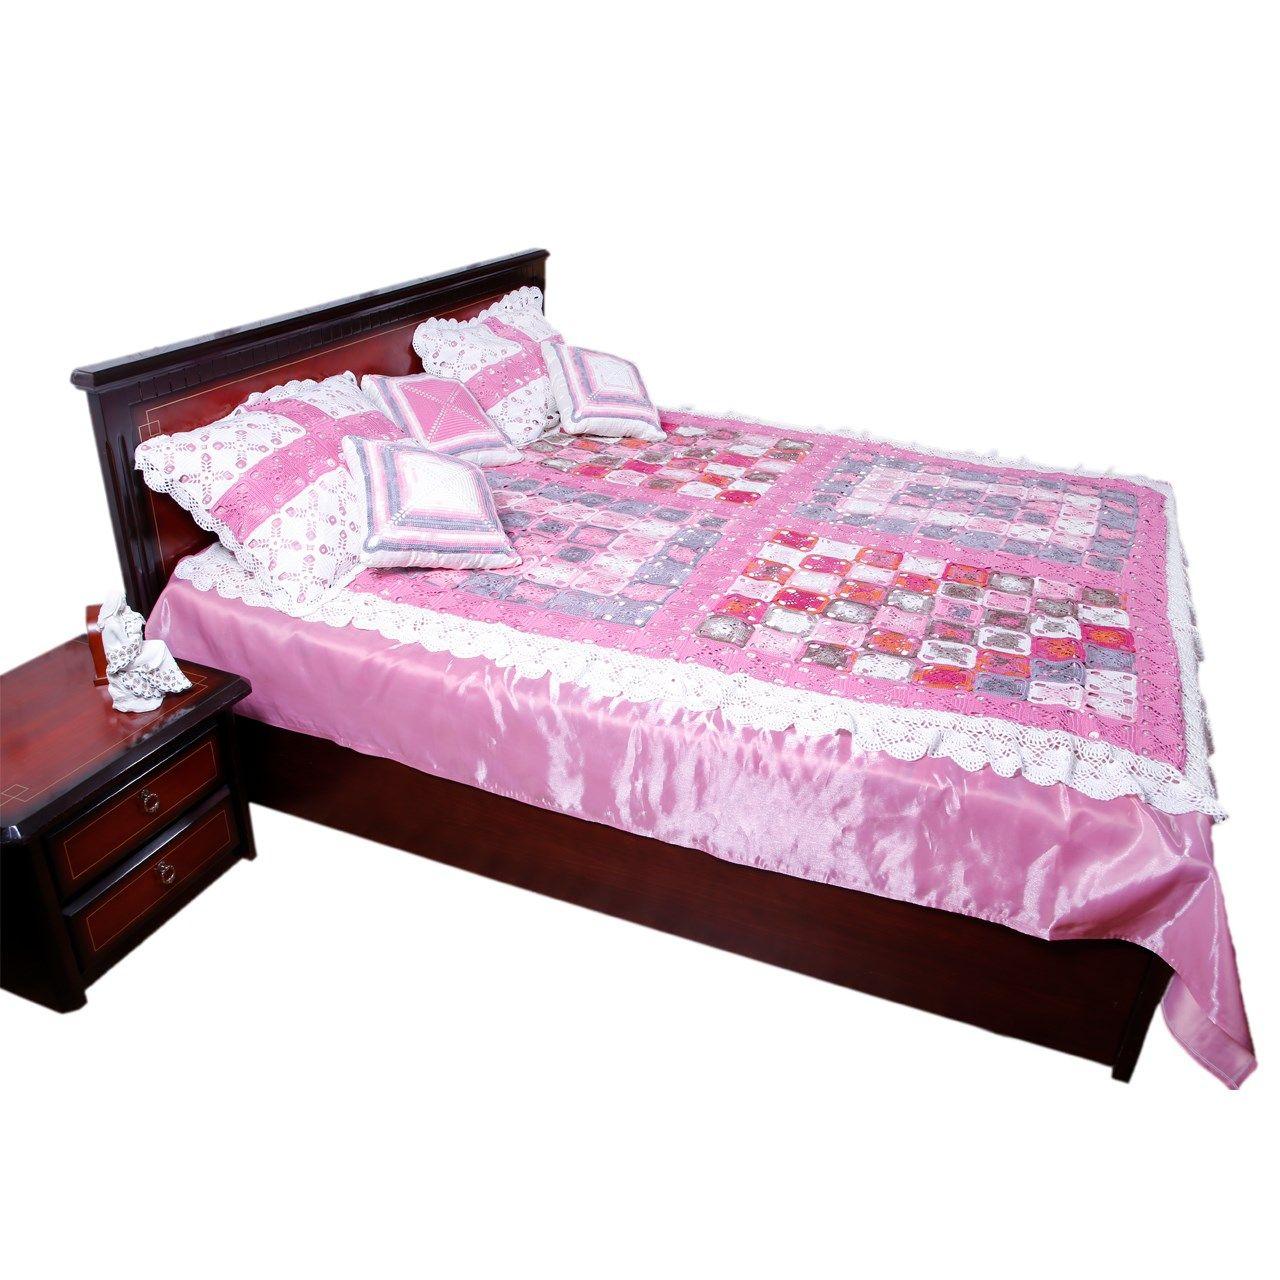 سرویس خواب ثمین مدل Pink Roze دو نفره 4 تکه